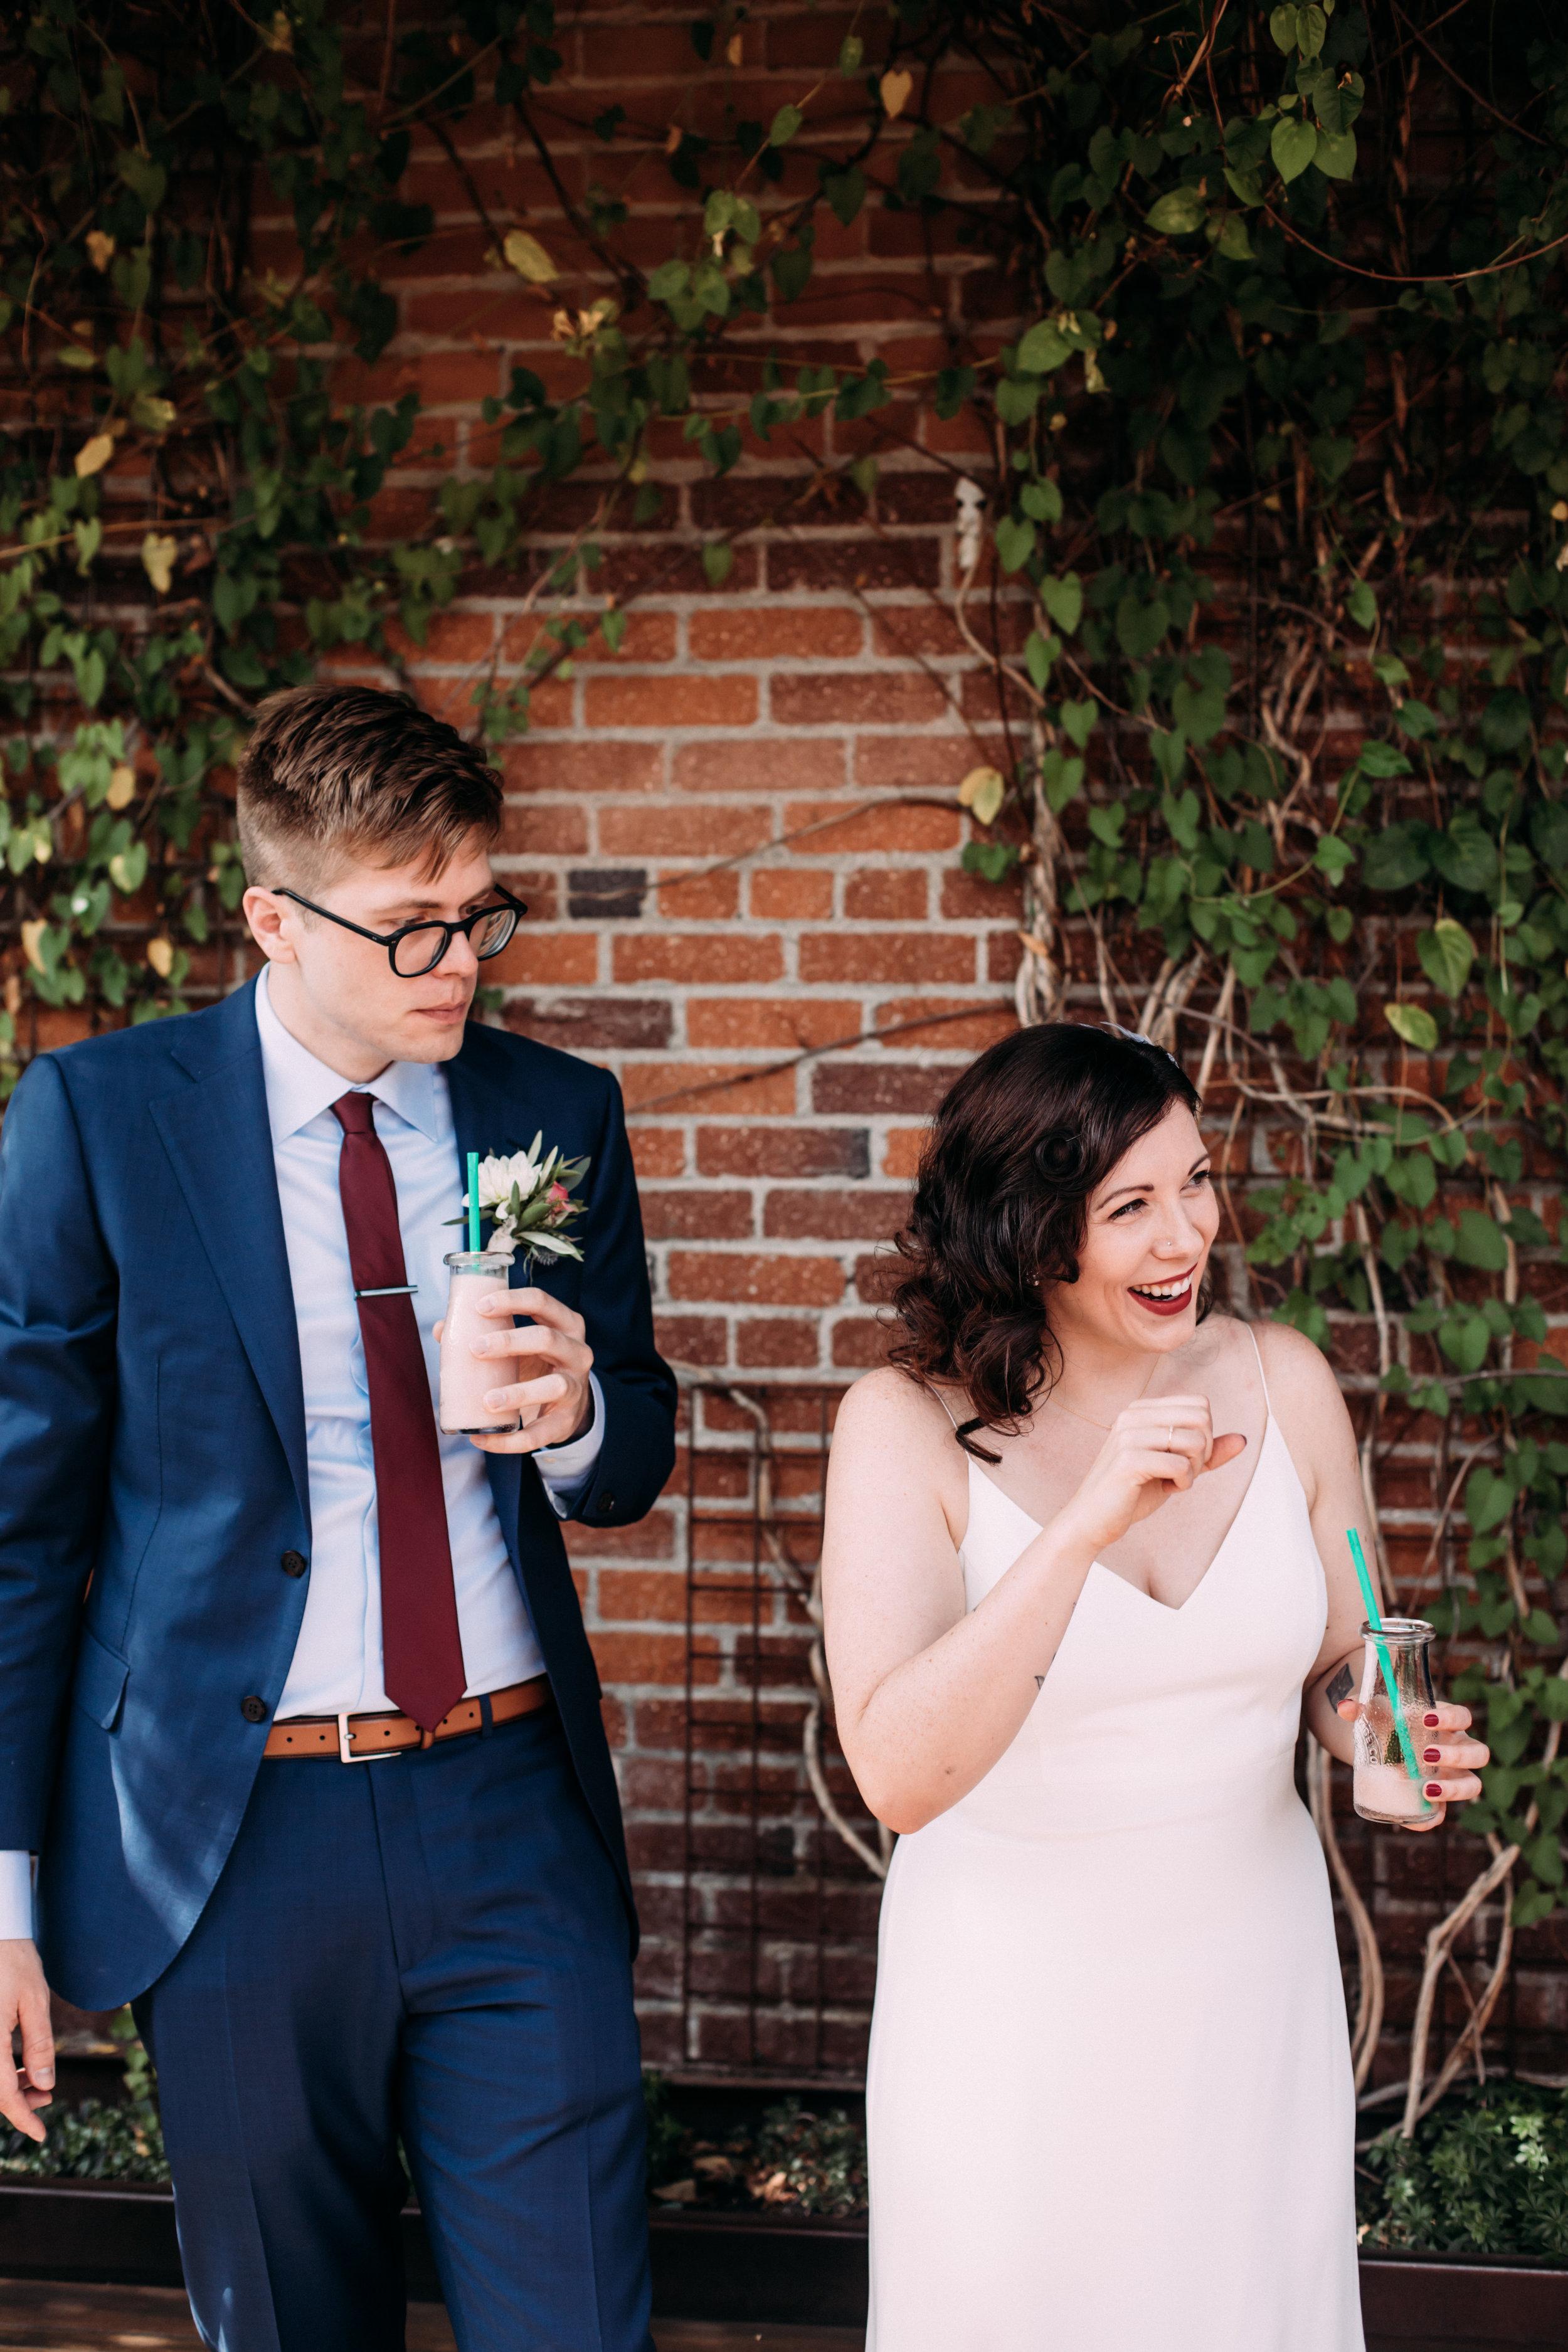 Ellen + Will | Ashlyn Savannah Photo | Pyramid Lake Elopement-18.jpg